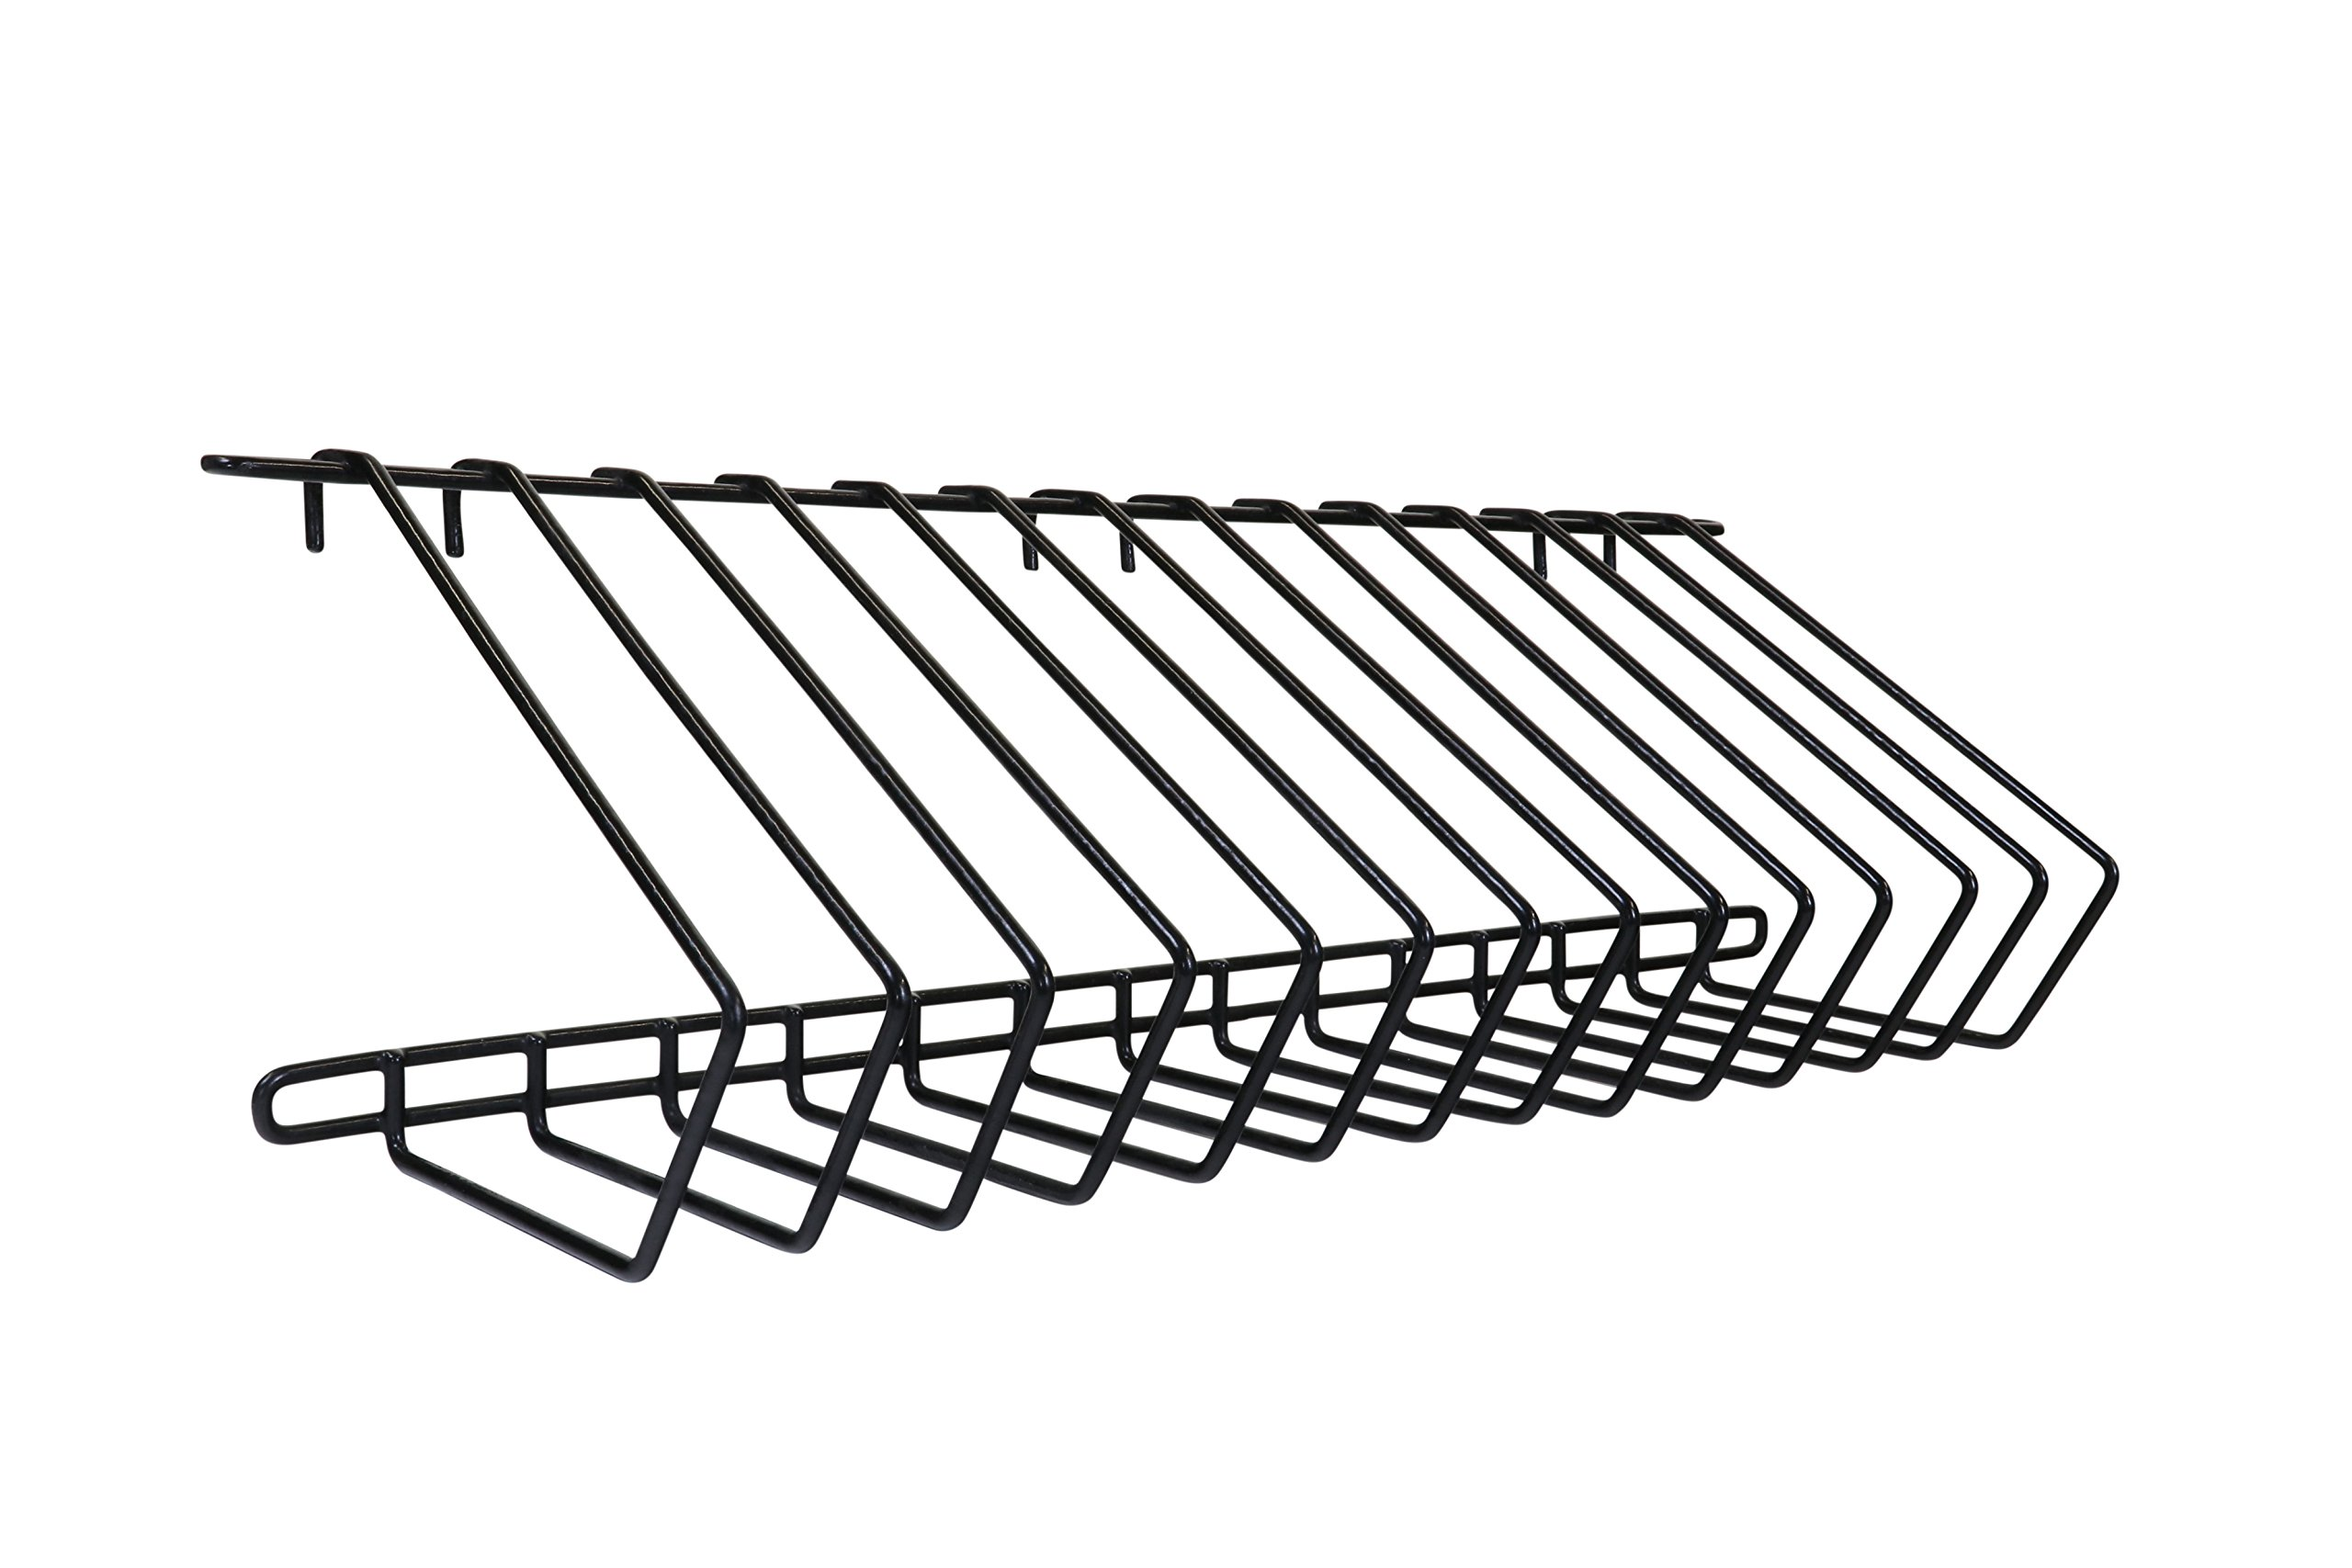 LocknCharge Carrier 30 Wire Rack Pair 13 Slot, Black (10107)